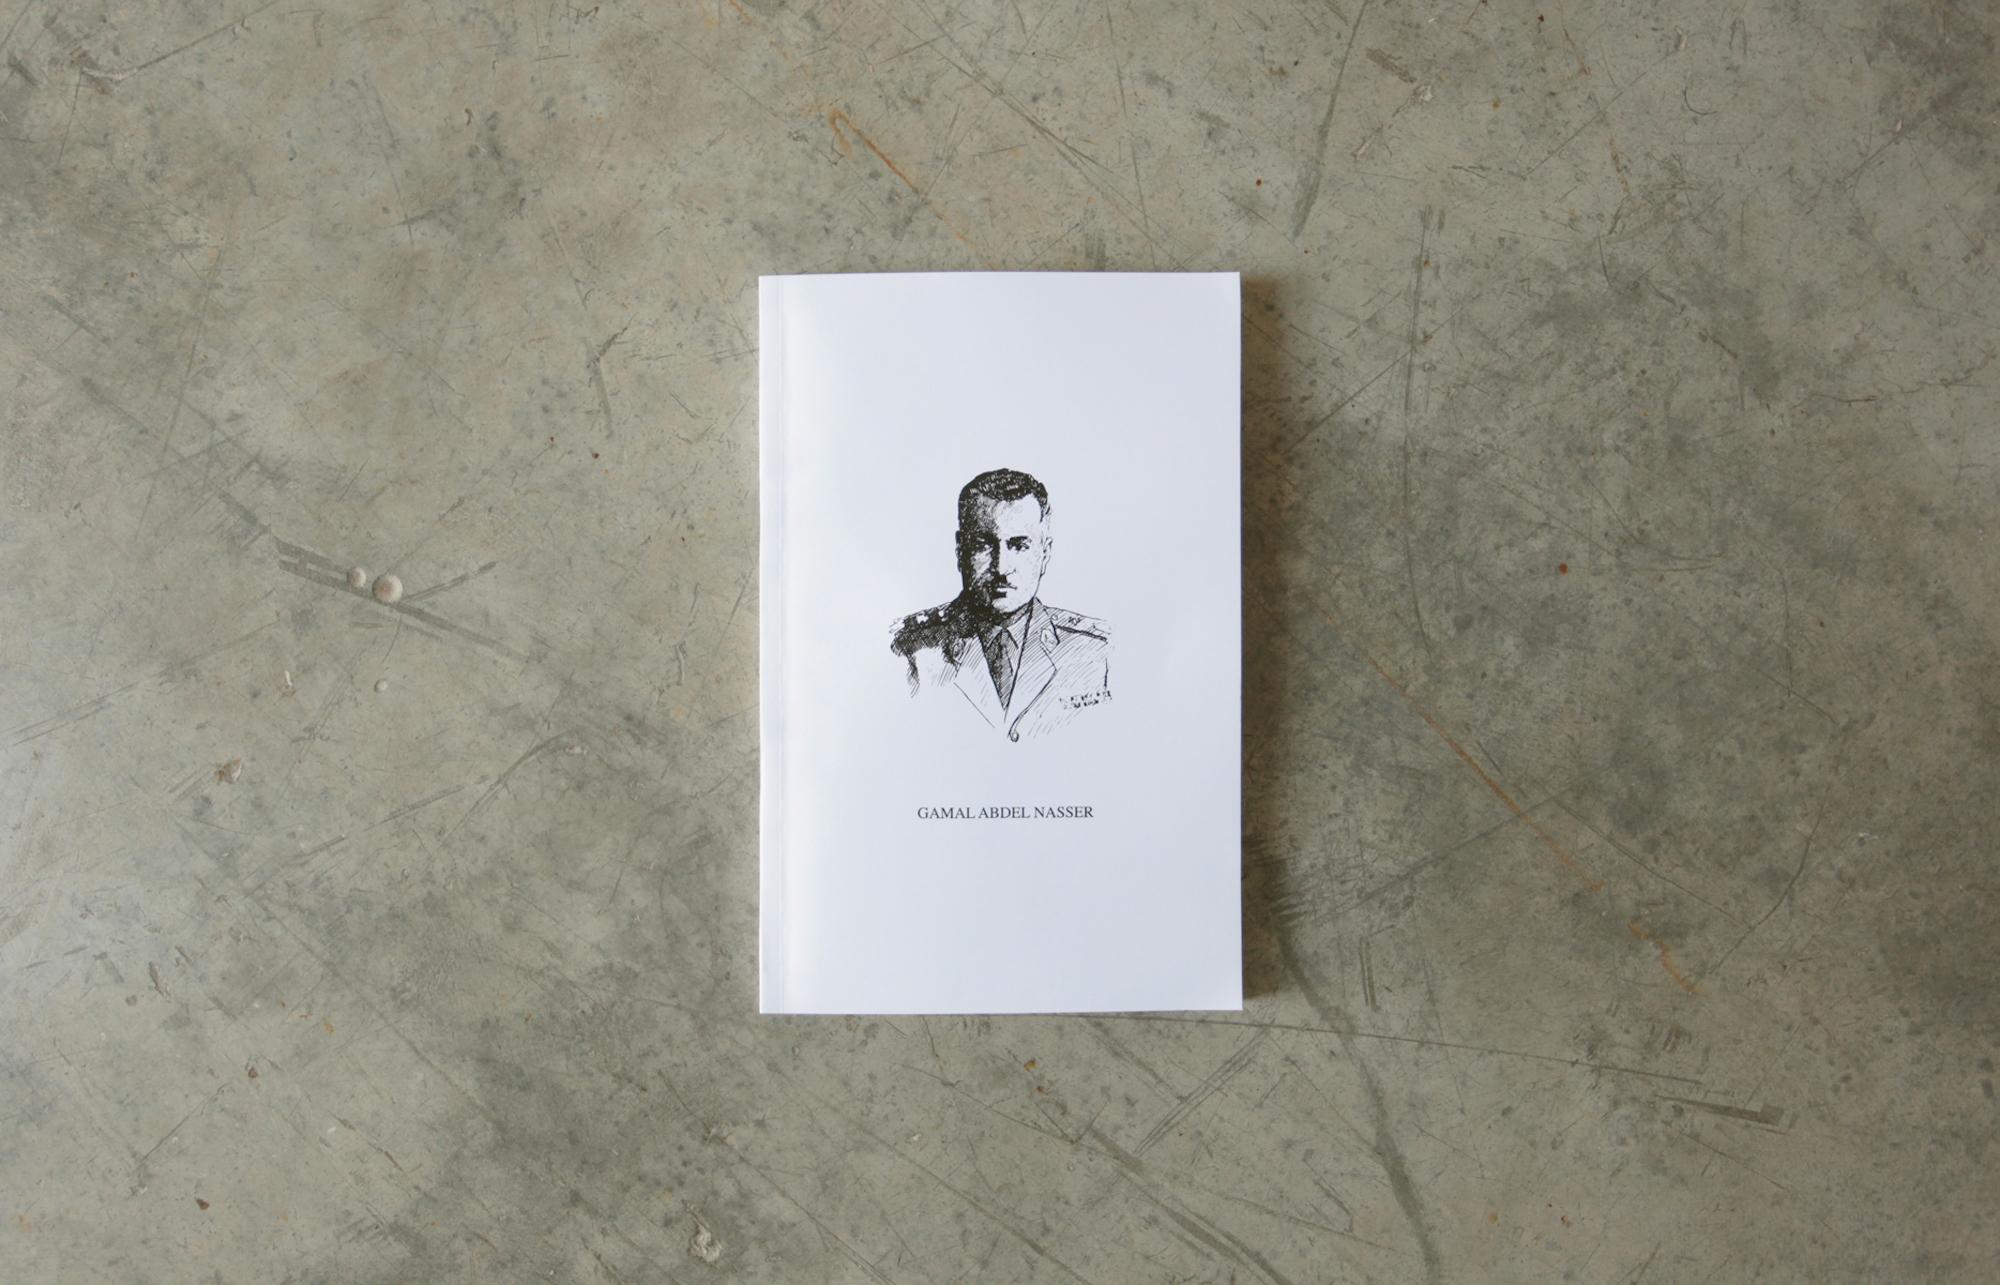 Lantian Xie  Gamal Abdel Nasser's Philosophy of A Revolution 2014 Hand-bound book 20 x 13 x 1 cm